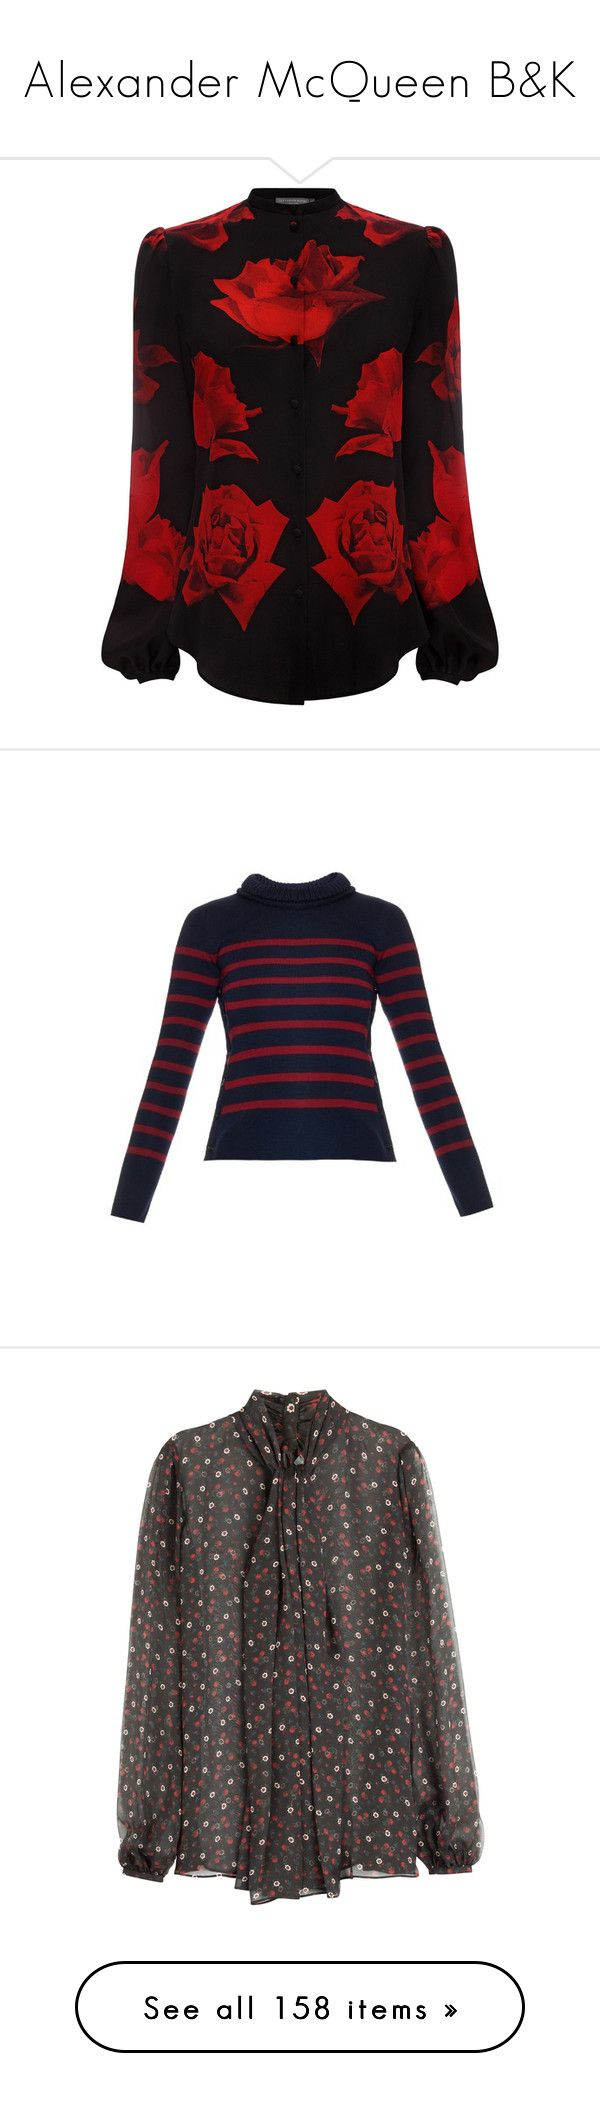 """Alexander McQueen B&K"" by duchessq ❤ liked on Polyvore featuring tops, round collar shirt, rose print top, mandarin collar shirt, red top, rounded collar shirt, sweaters, navy stripe, breton stripe sweater and alexander mcqueen sweater"